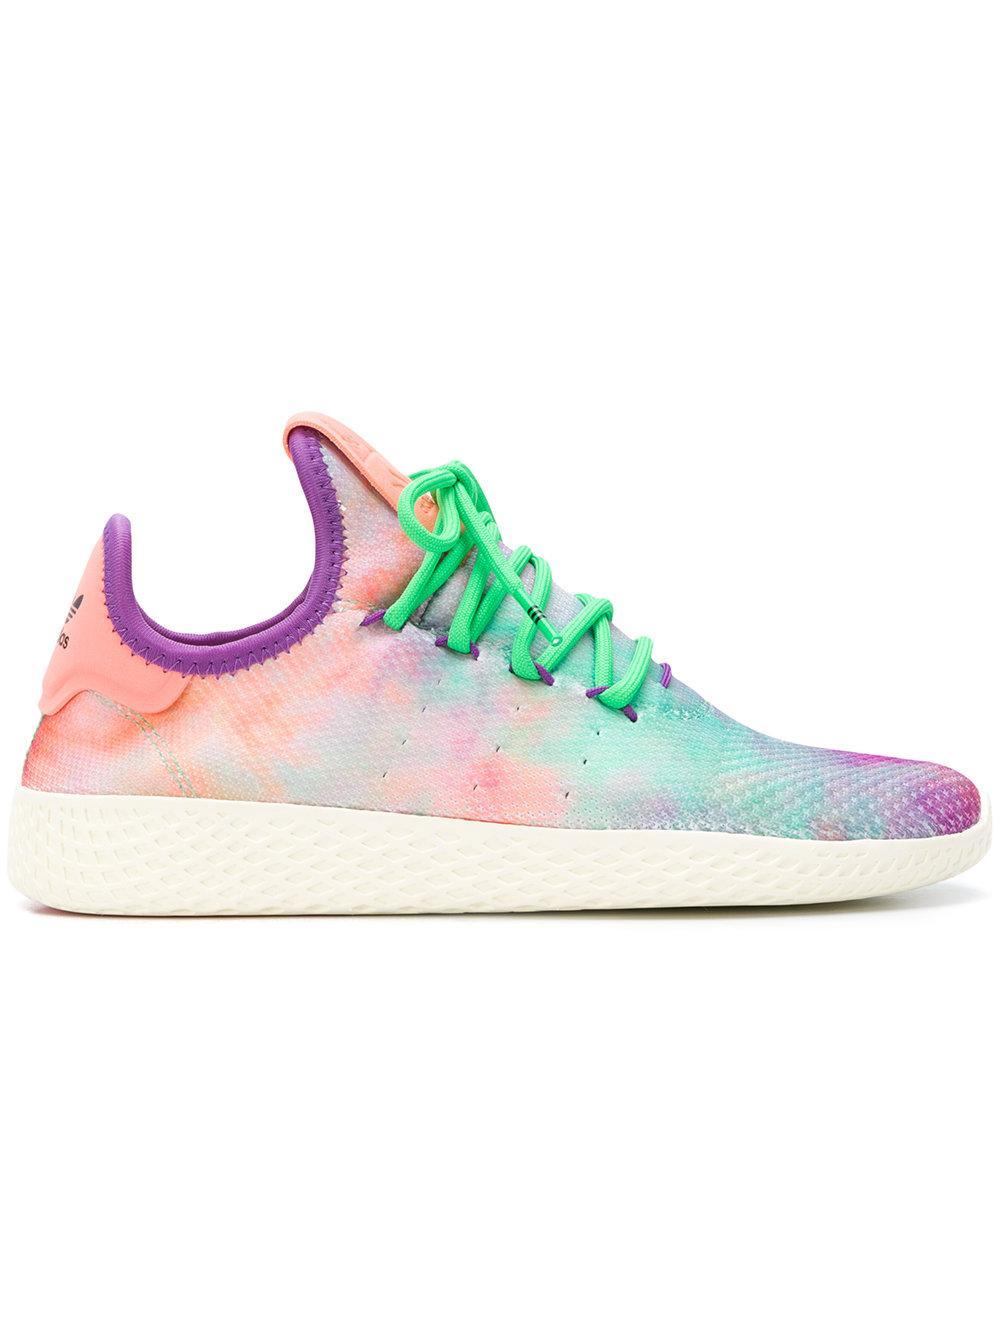 f8b16fec8 Adidas Originals Adidas Pharrell Williams Hu Holi Tennis Hu Mc Sneakers -  Multicolour